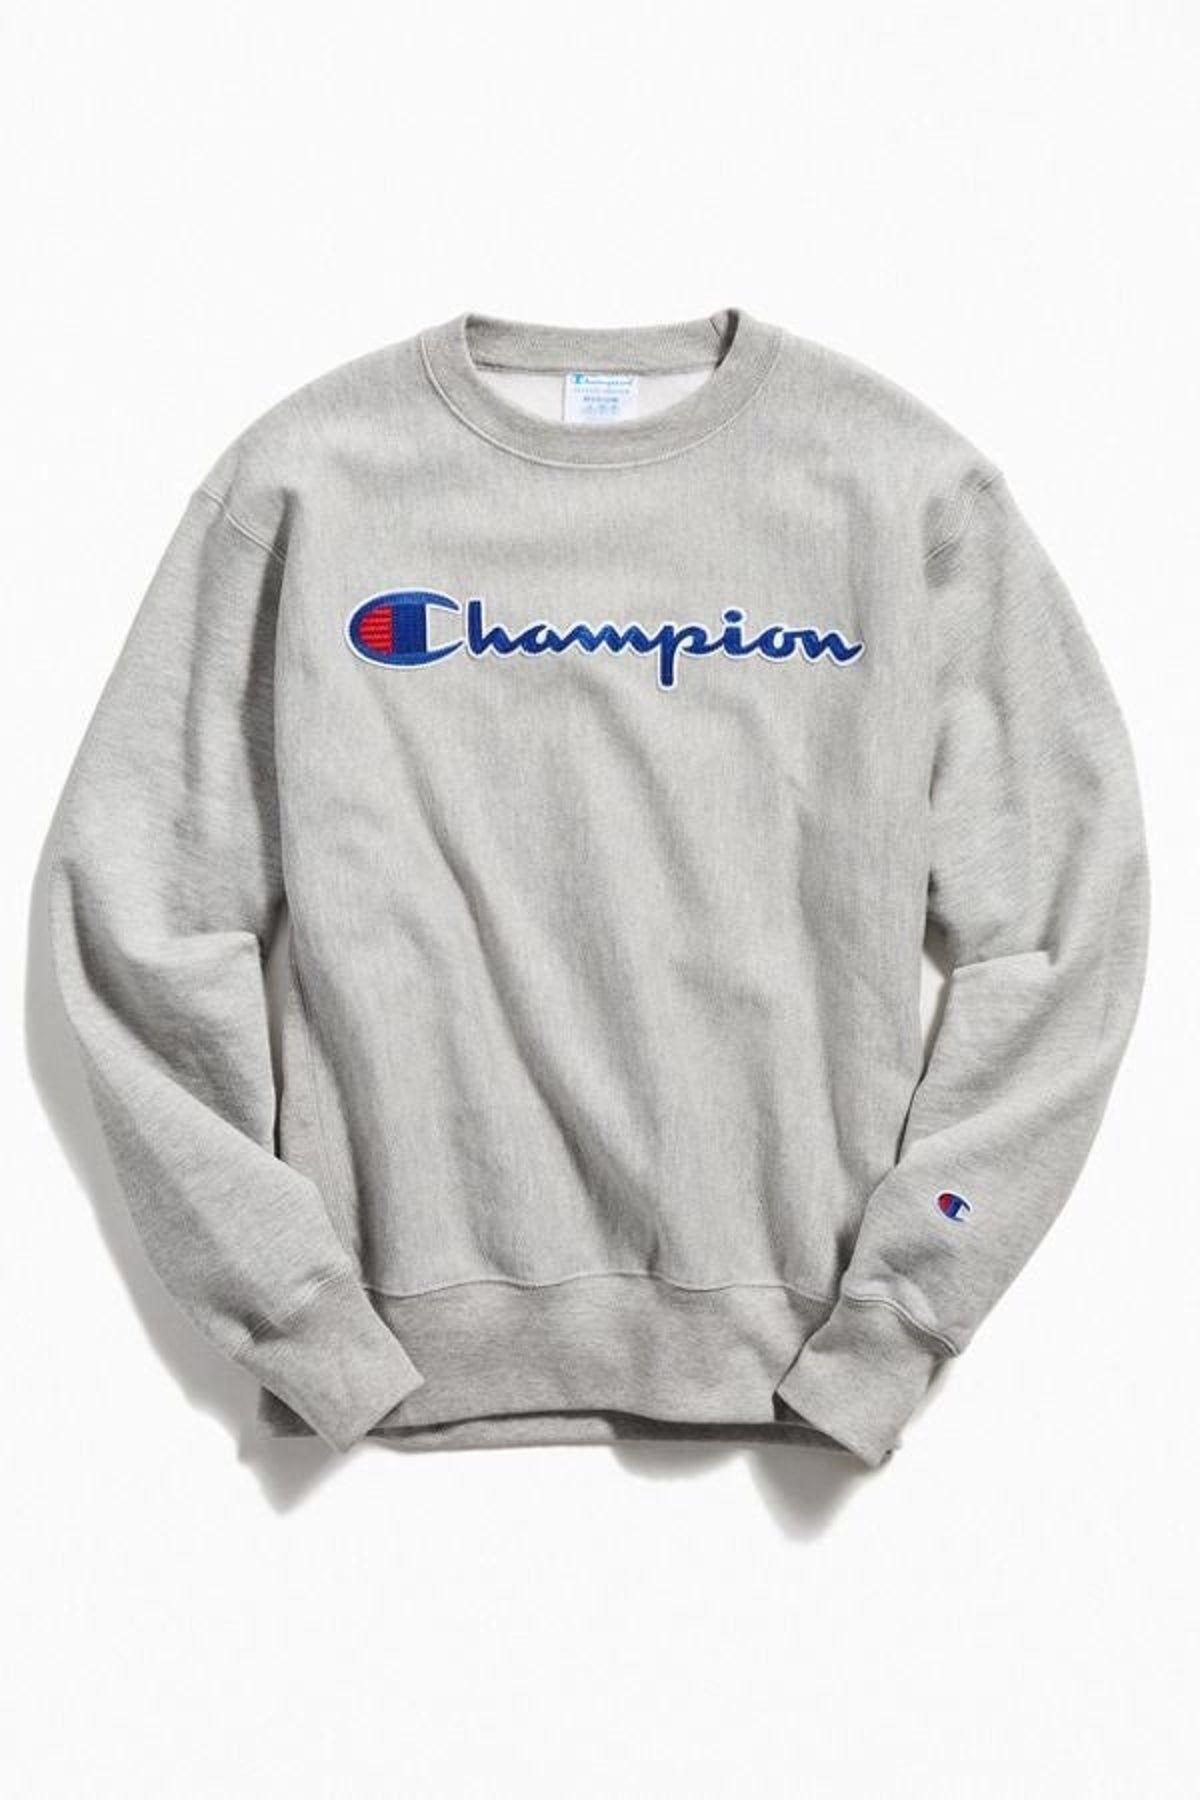 Champion Crew-Neck Sweatshirt #championhoodie